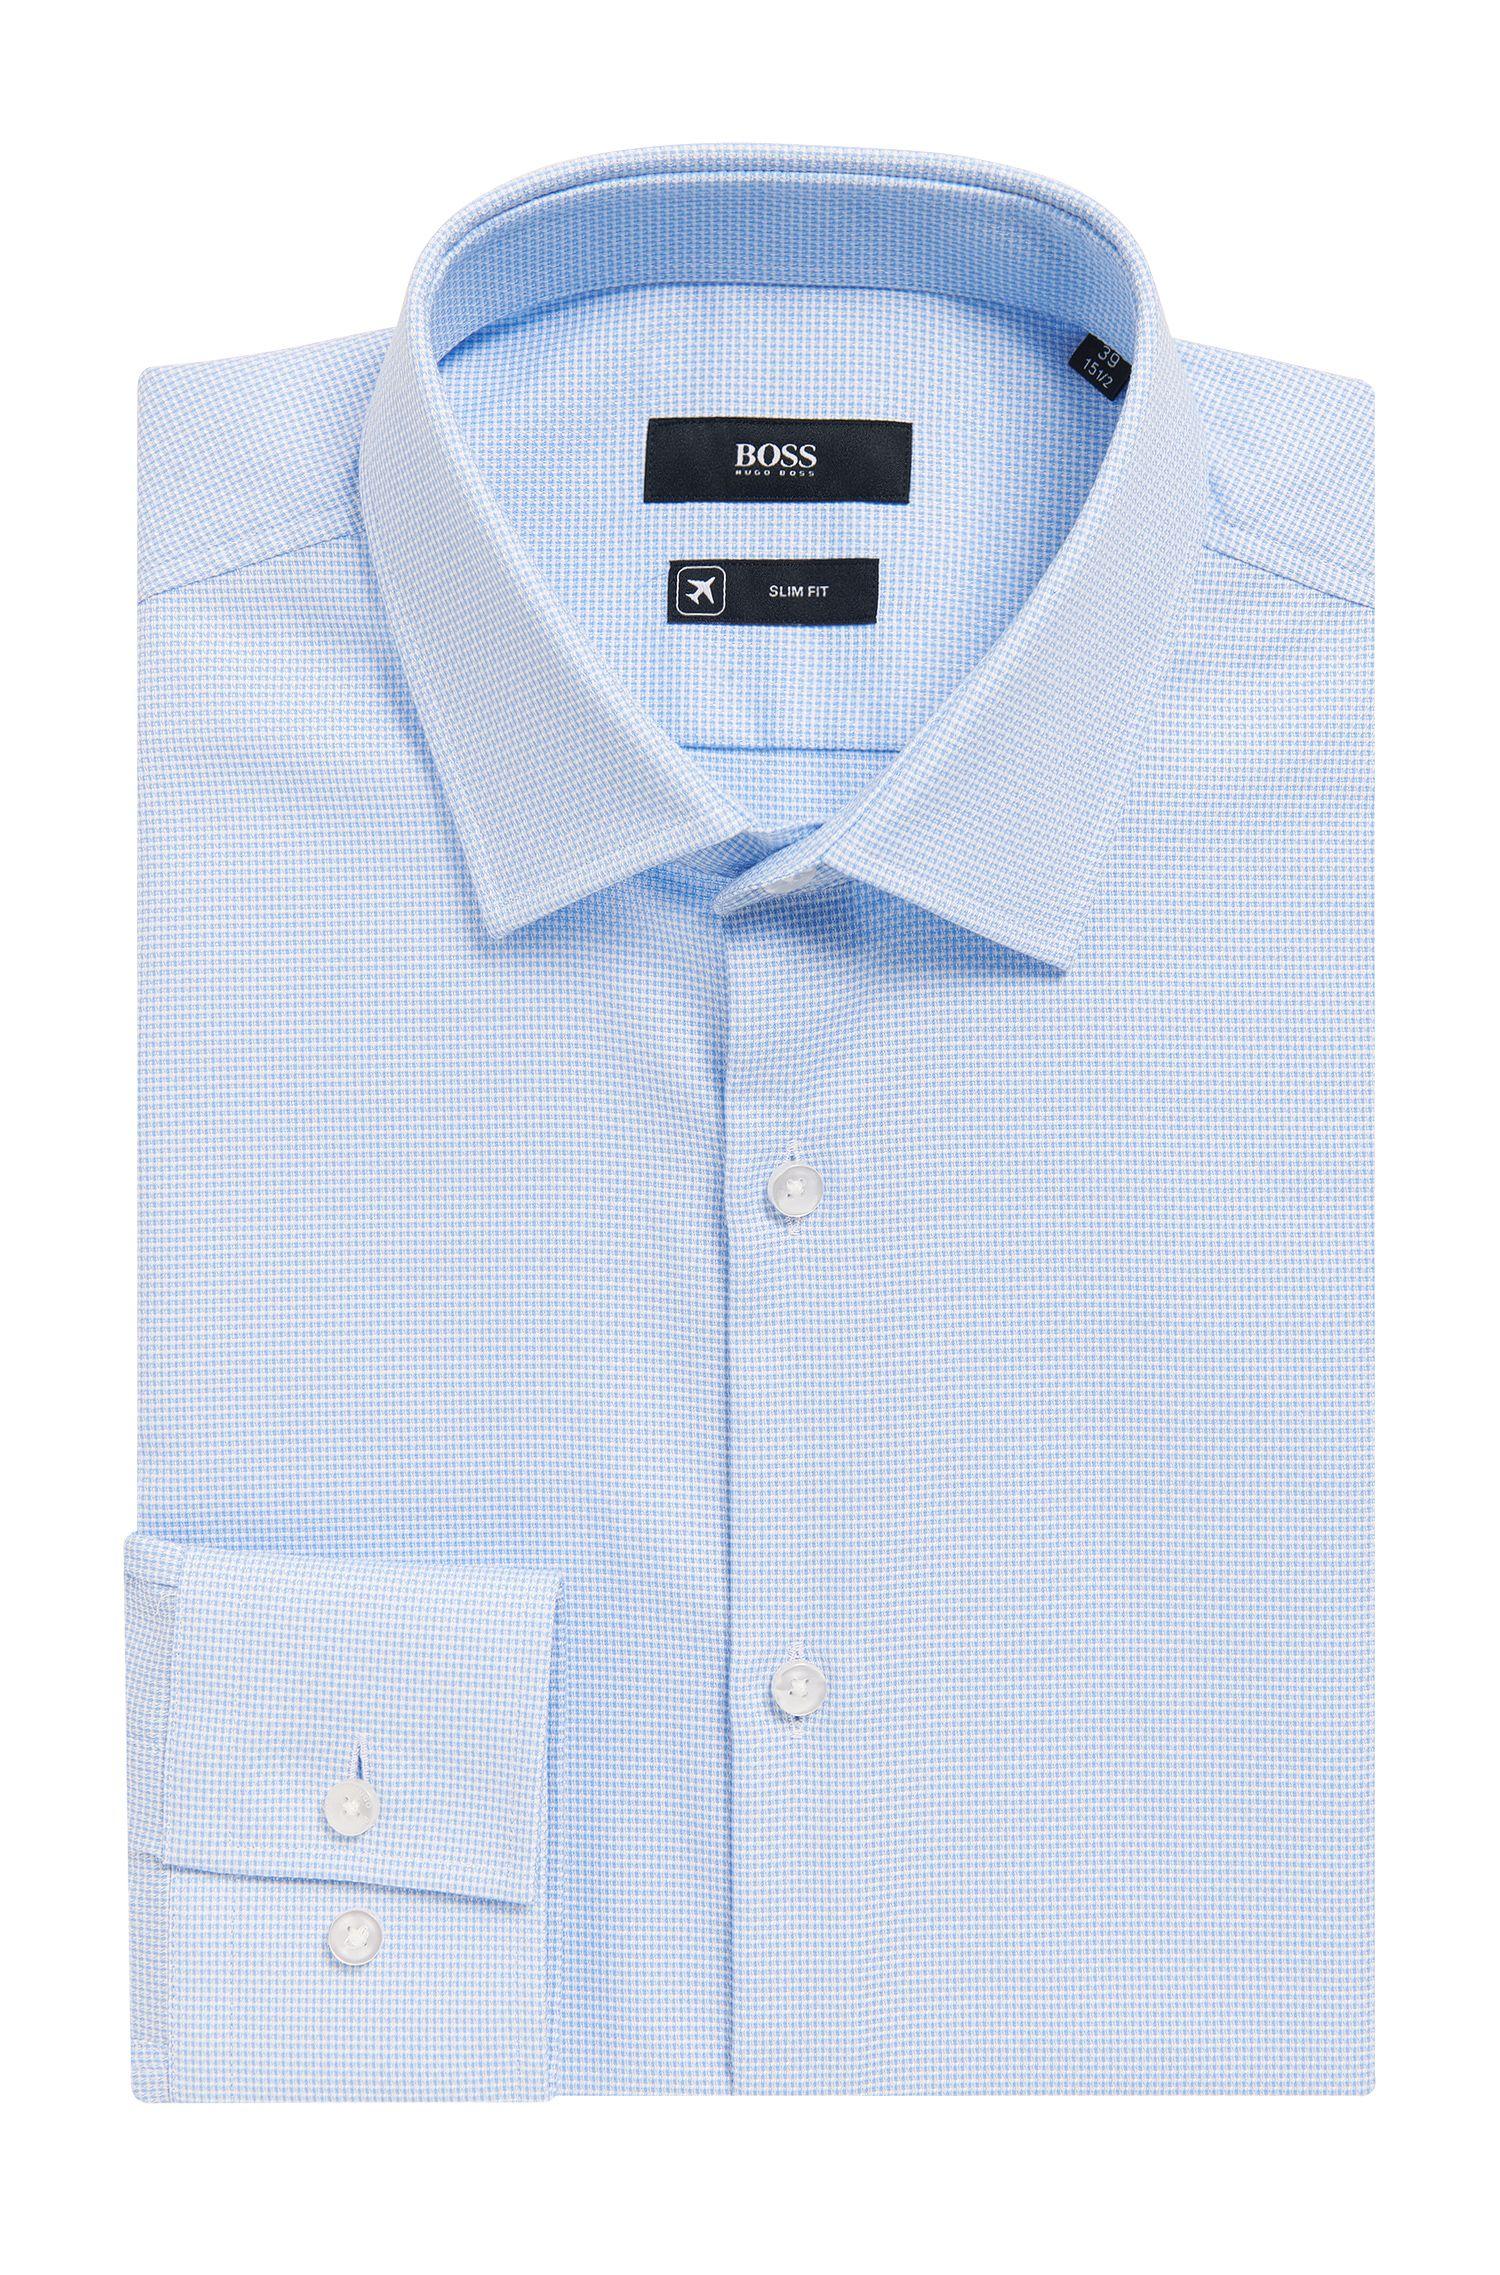 Nailhead Cotton Traveler Dress Shirt, Slim Fit | Jenno